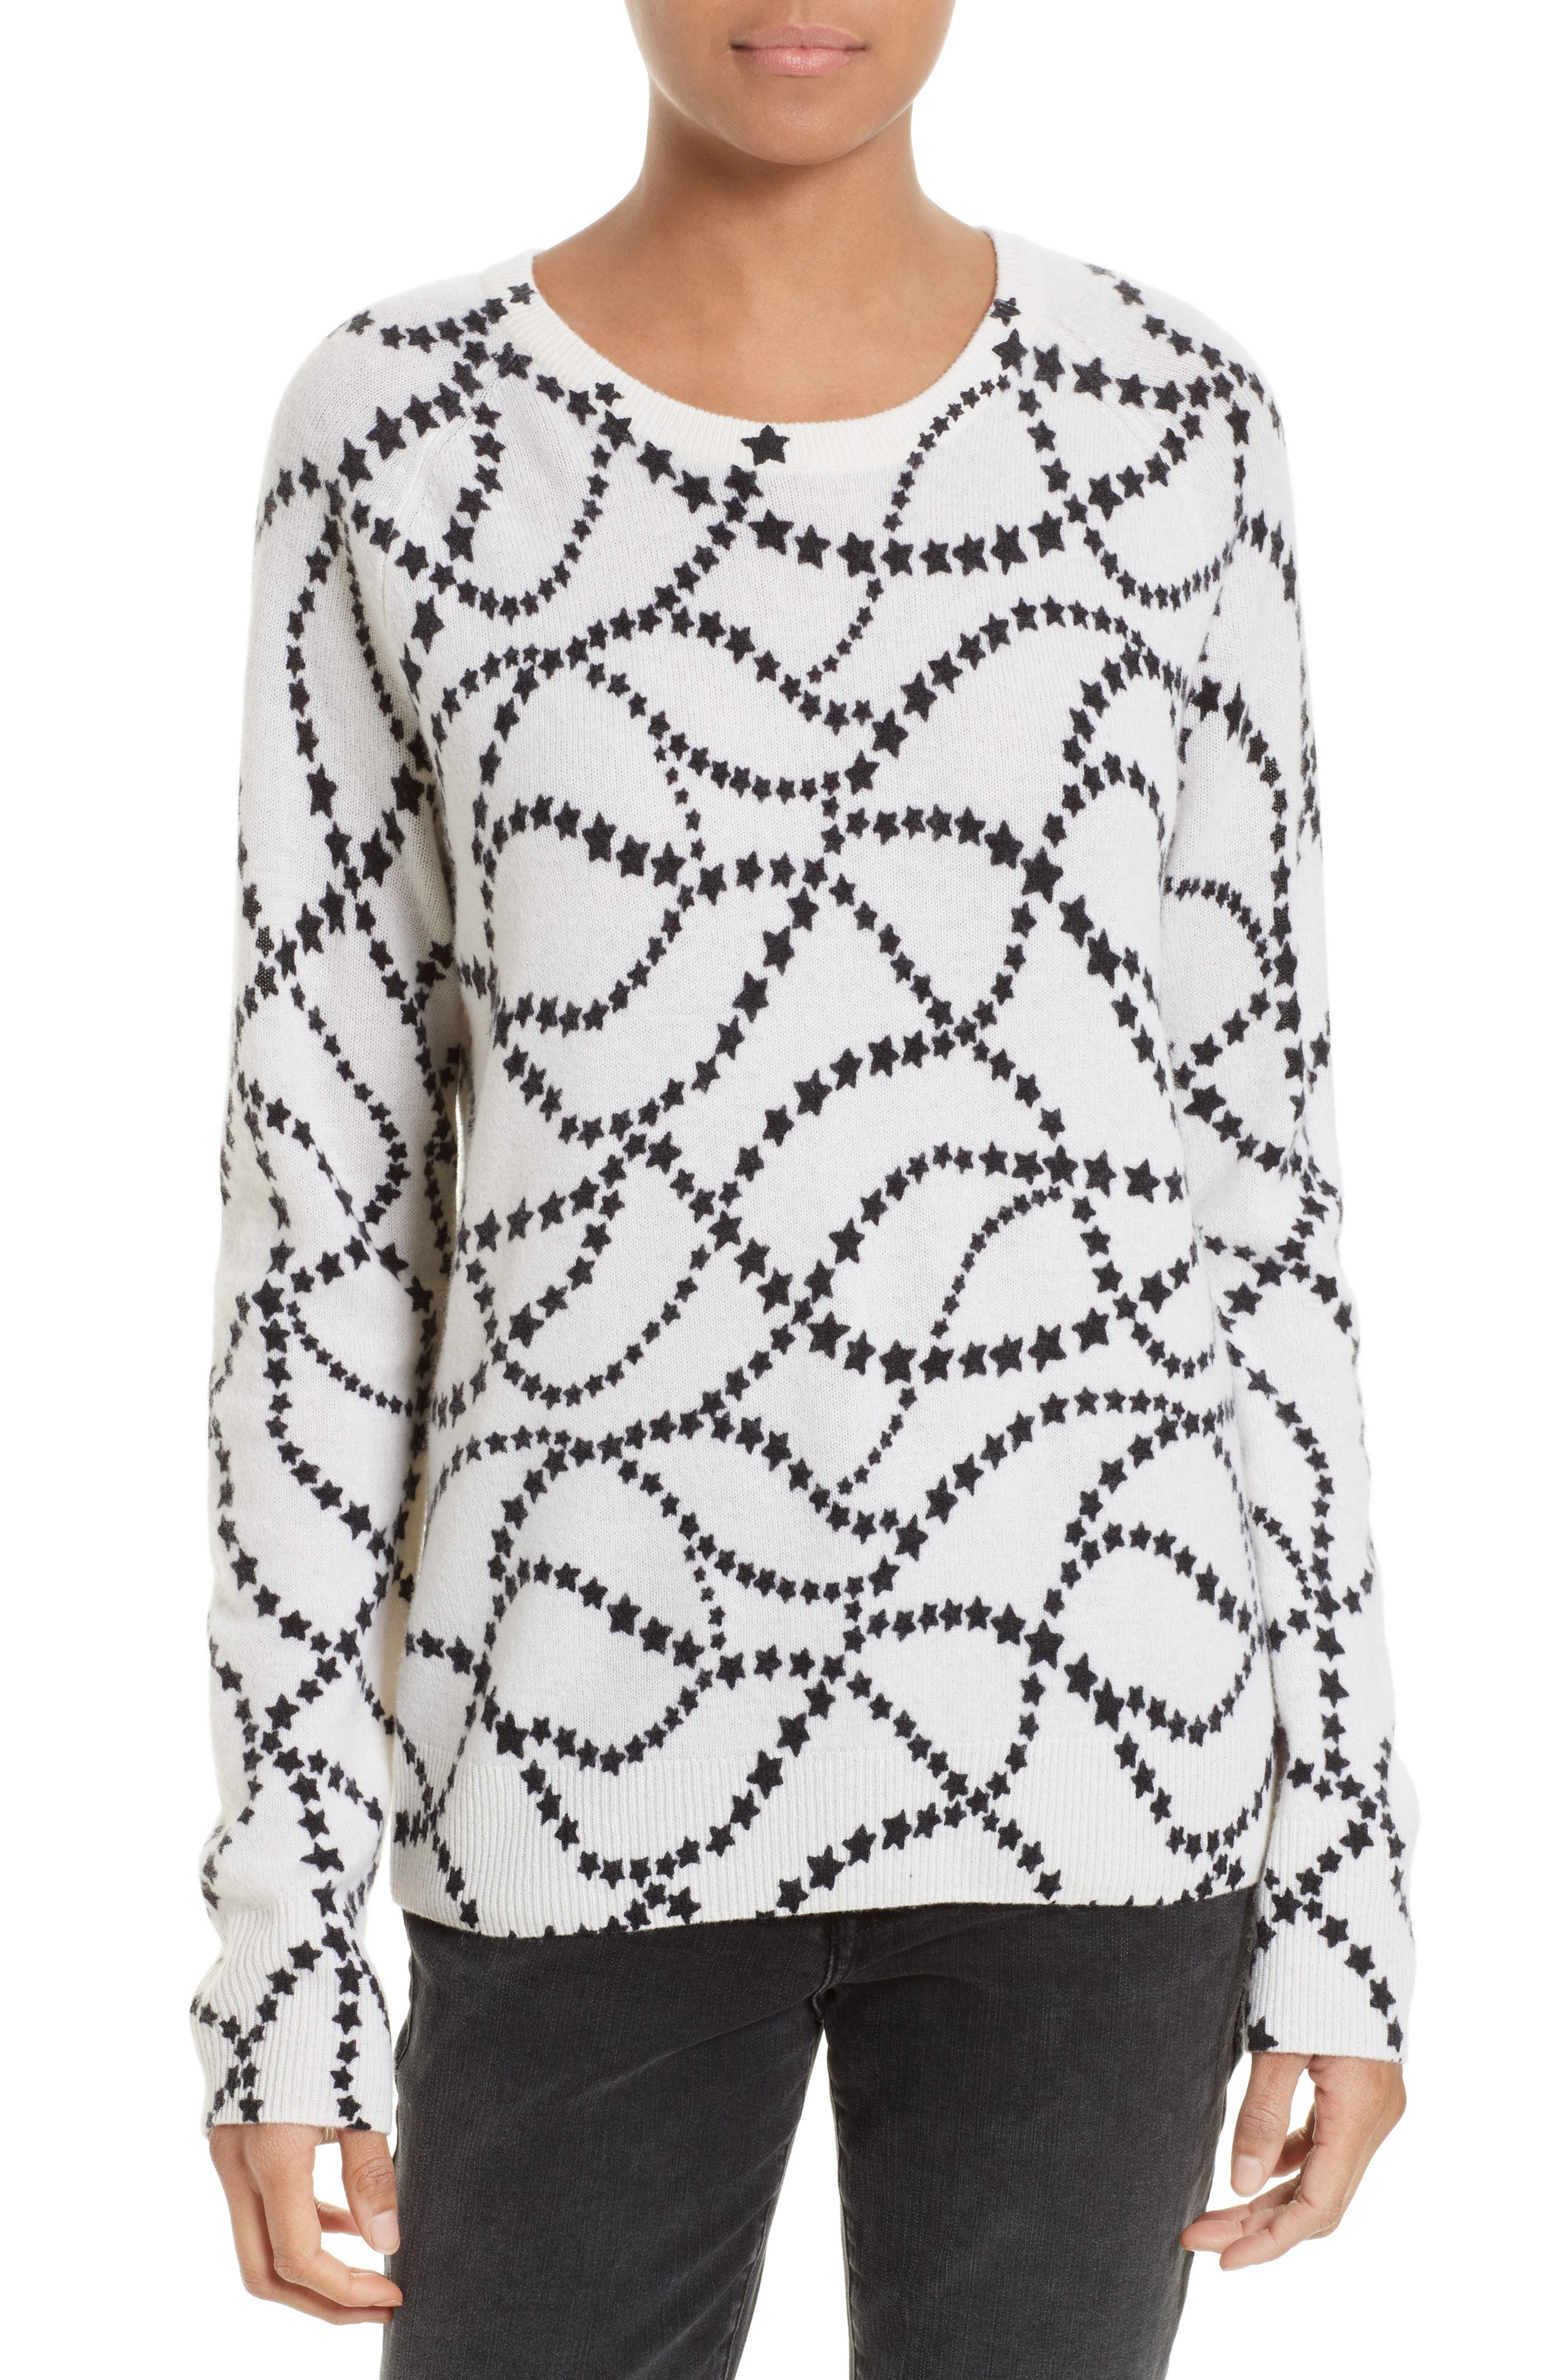 Equipment Sloane Star Print Cashmere Sweater